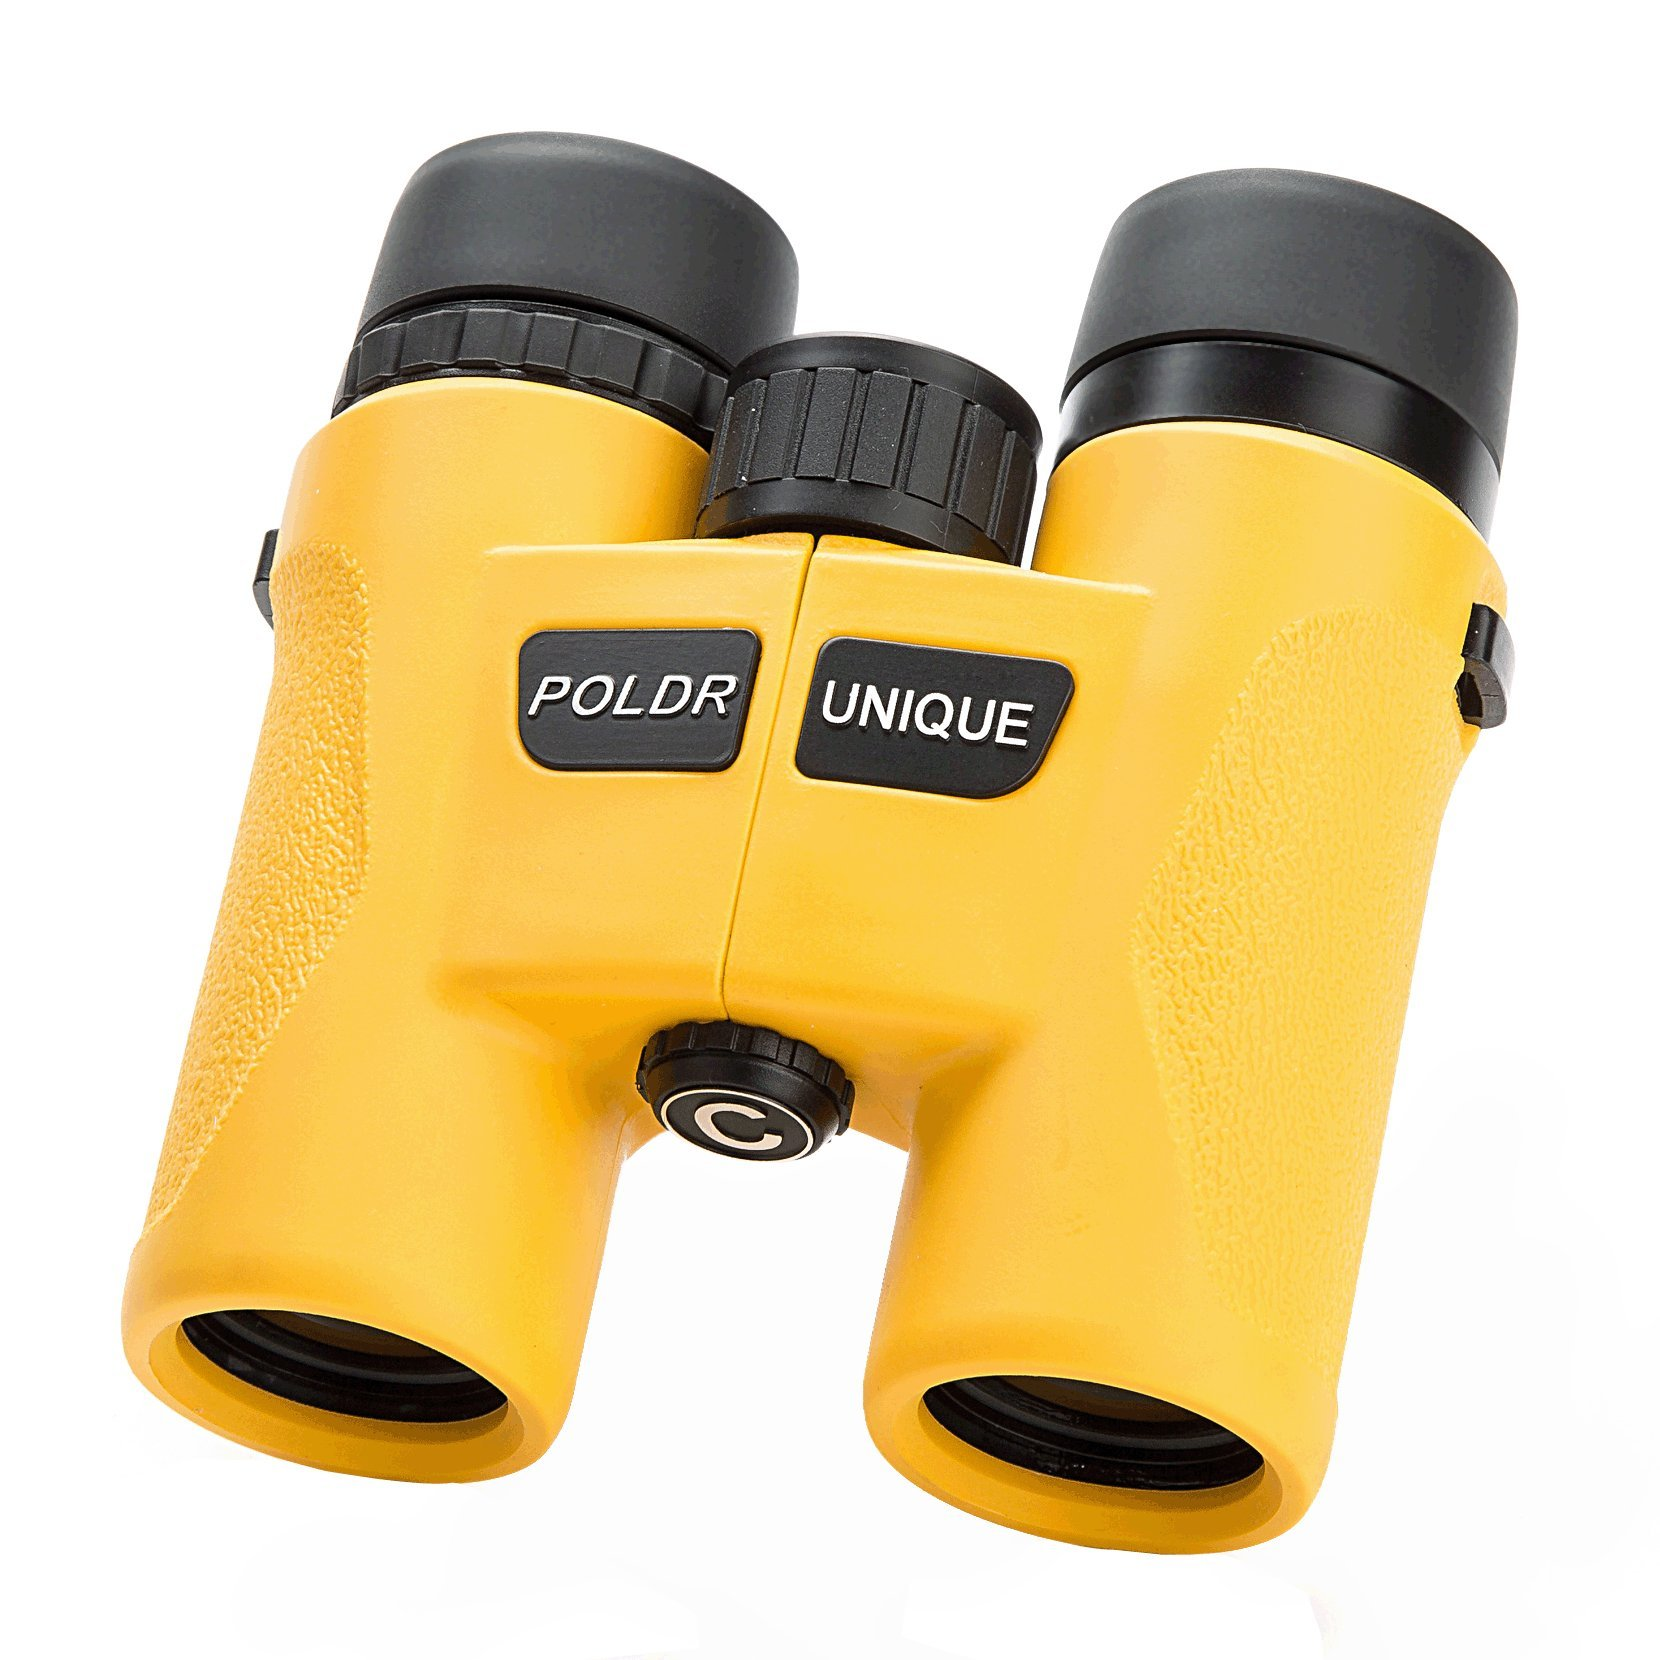 Binoculars Compact Roof Prism 8x32 for Bird watching Stargazing Wildlife Concert Sport Sightseeing (Yellow)